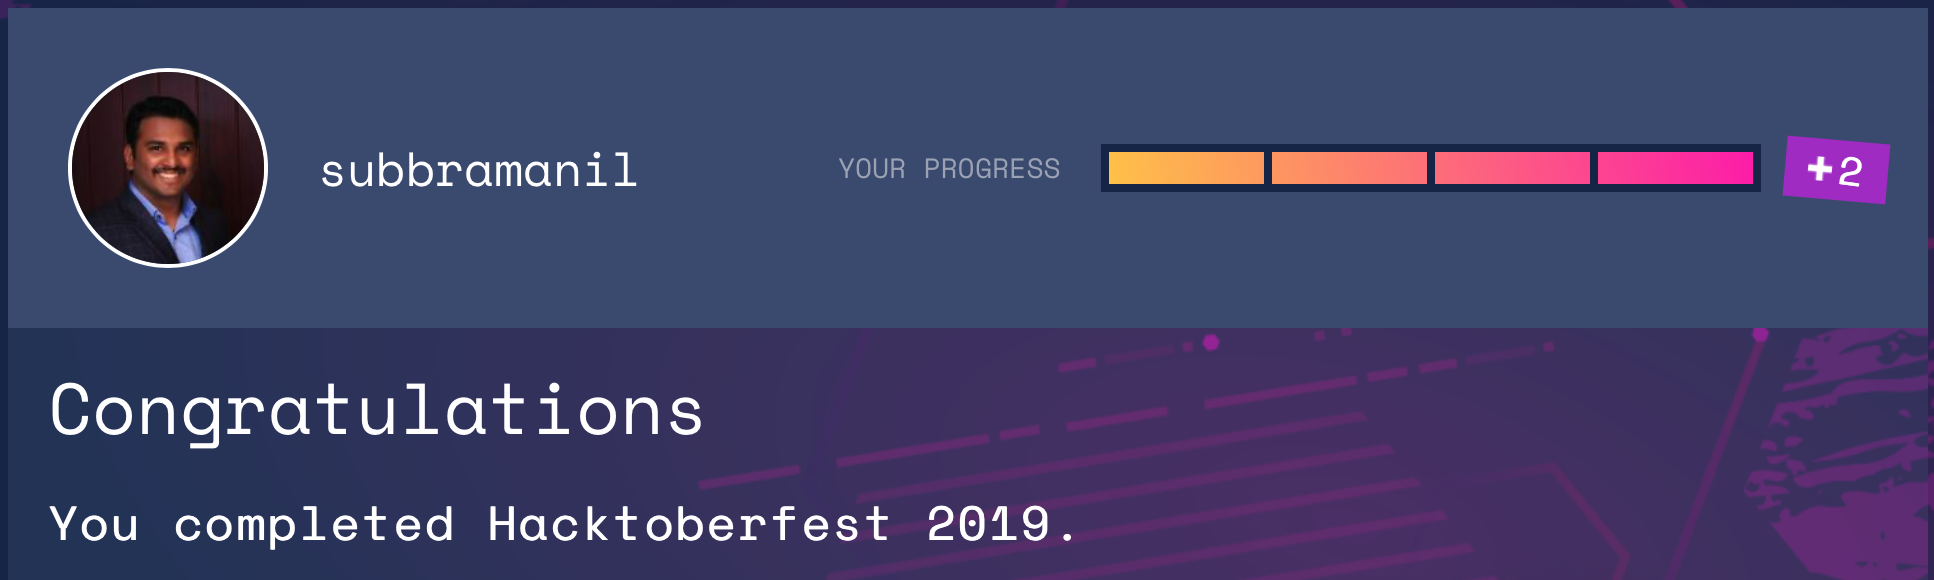 Hacktober Completion Status